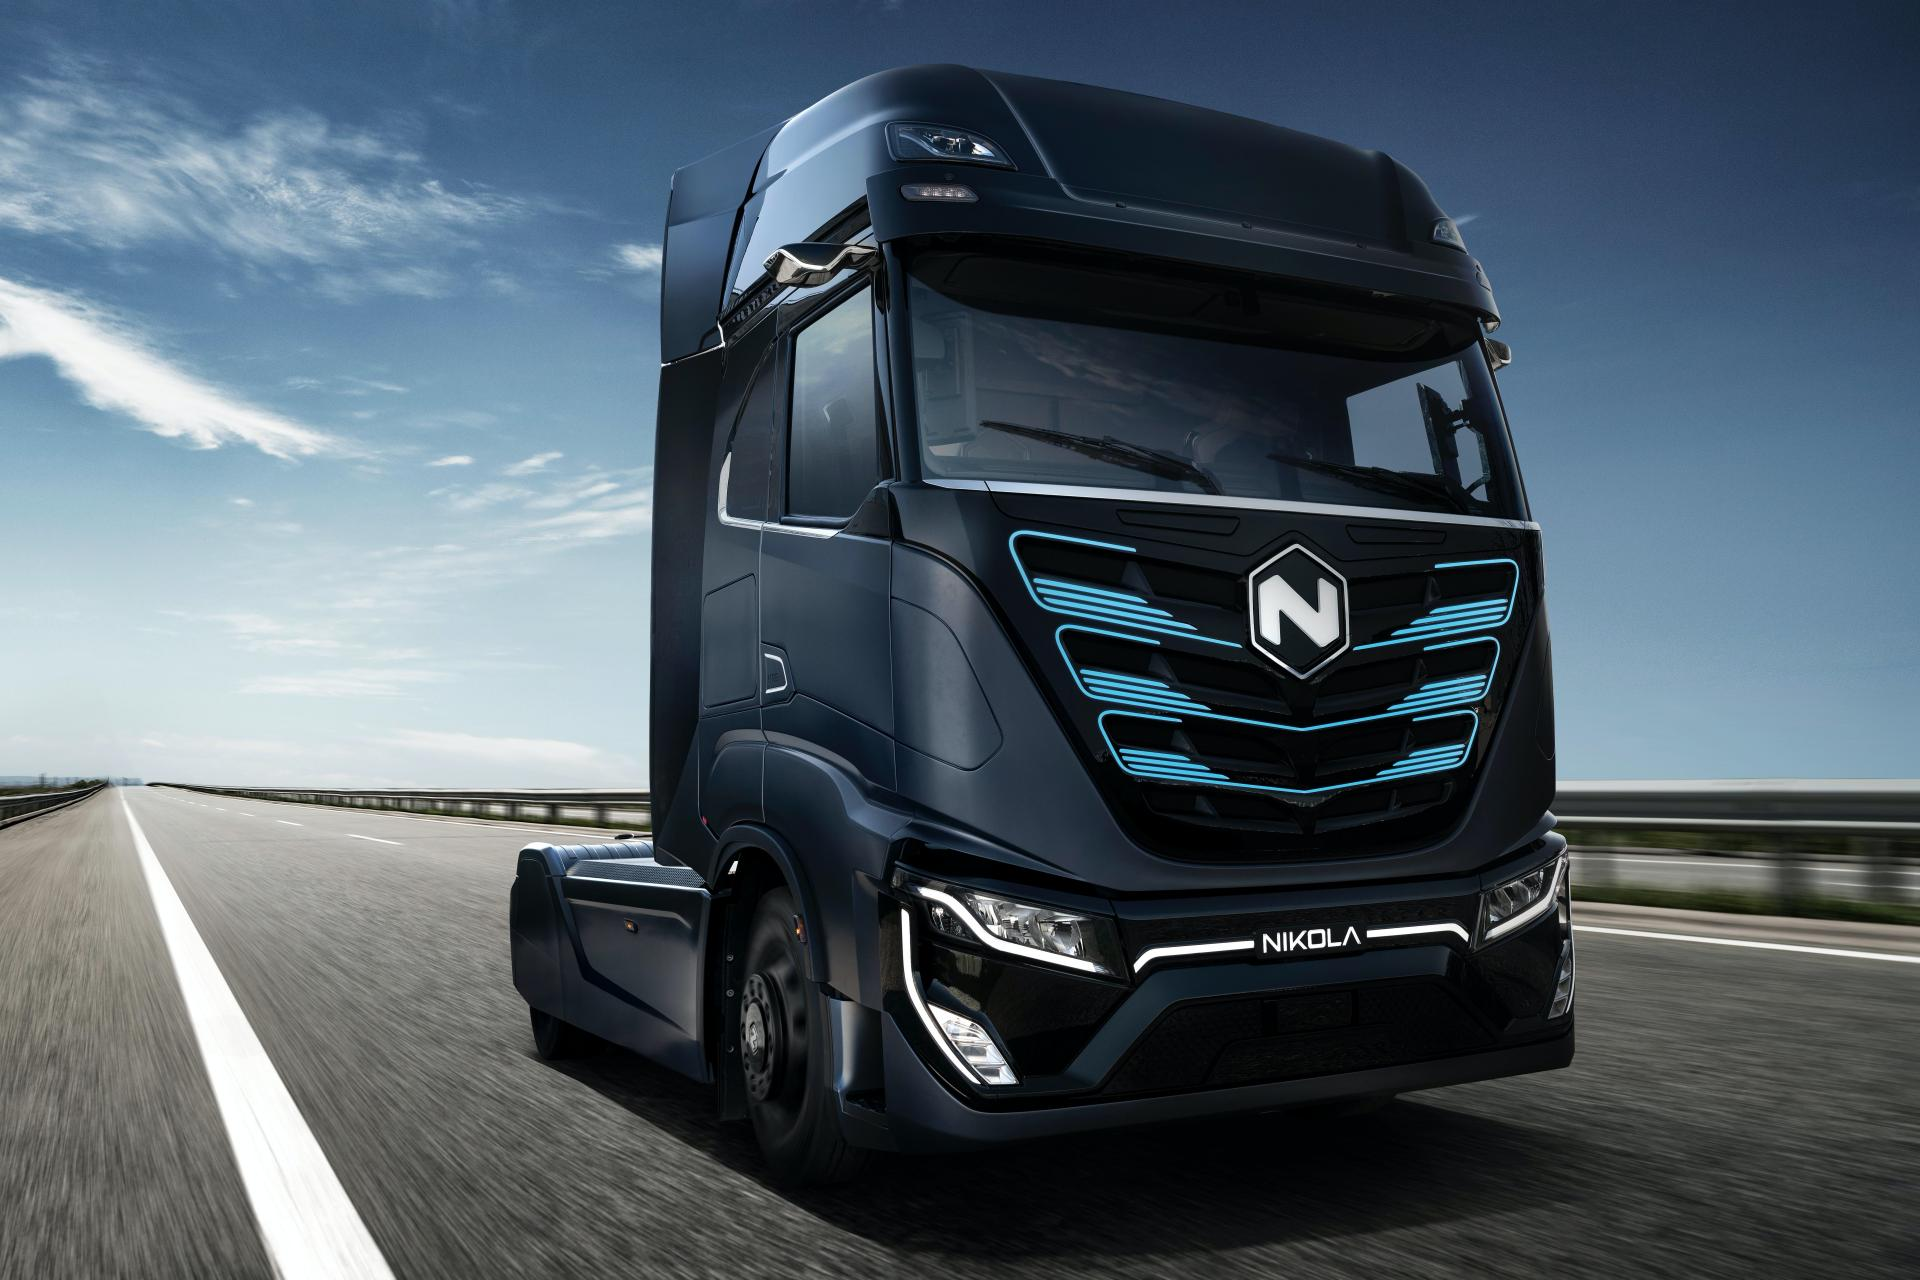 Nikola-TRE-electric-truck-3